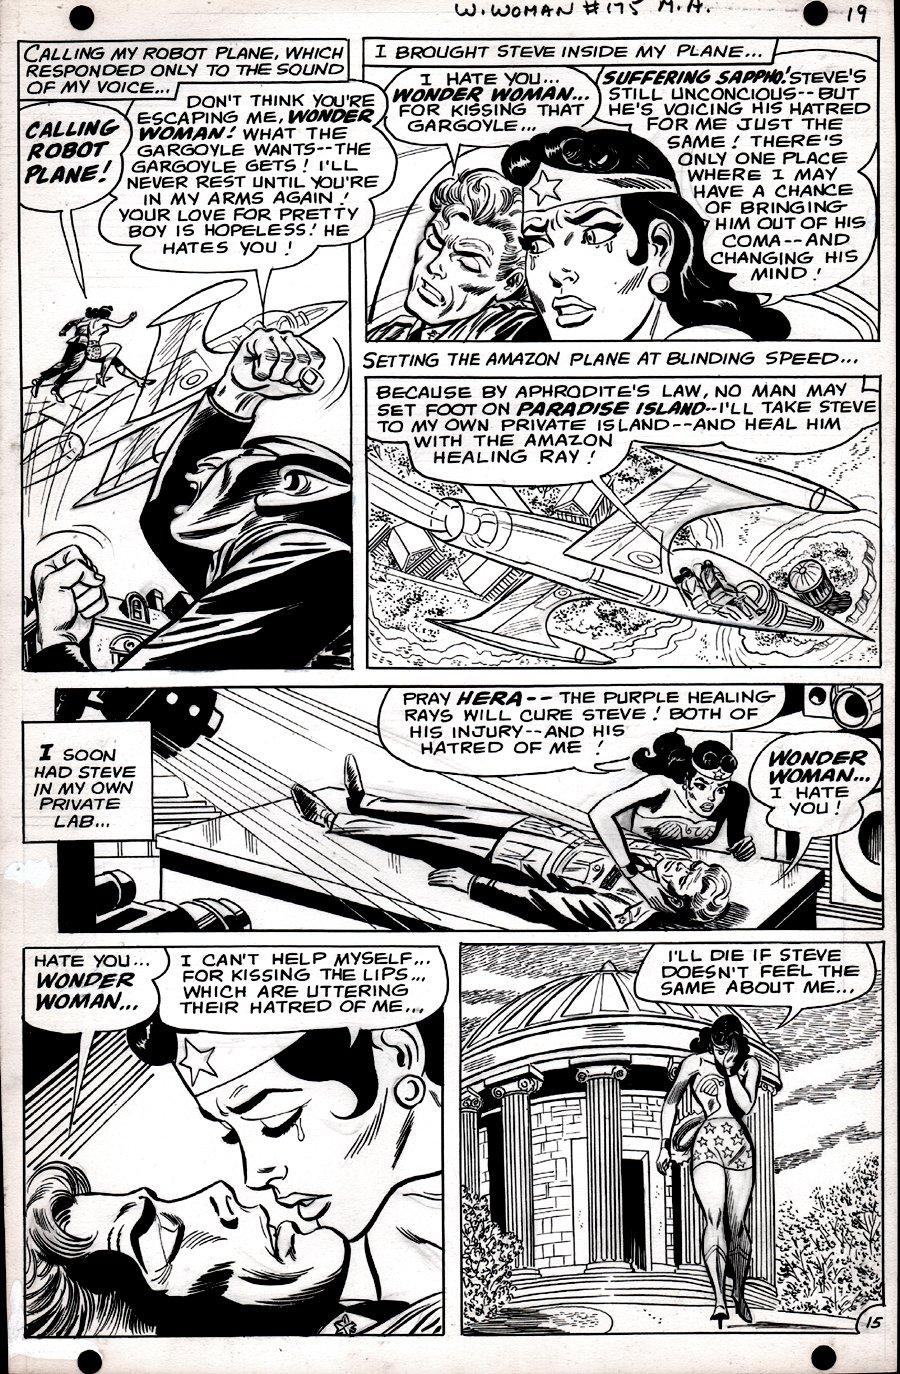 Wonder Woman #175 p 15 (SILVER AGE, WONDER WOMAN KISSES STEVE TREVOR!) 1967